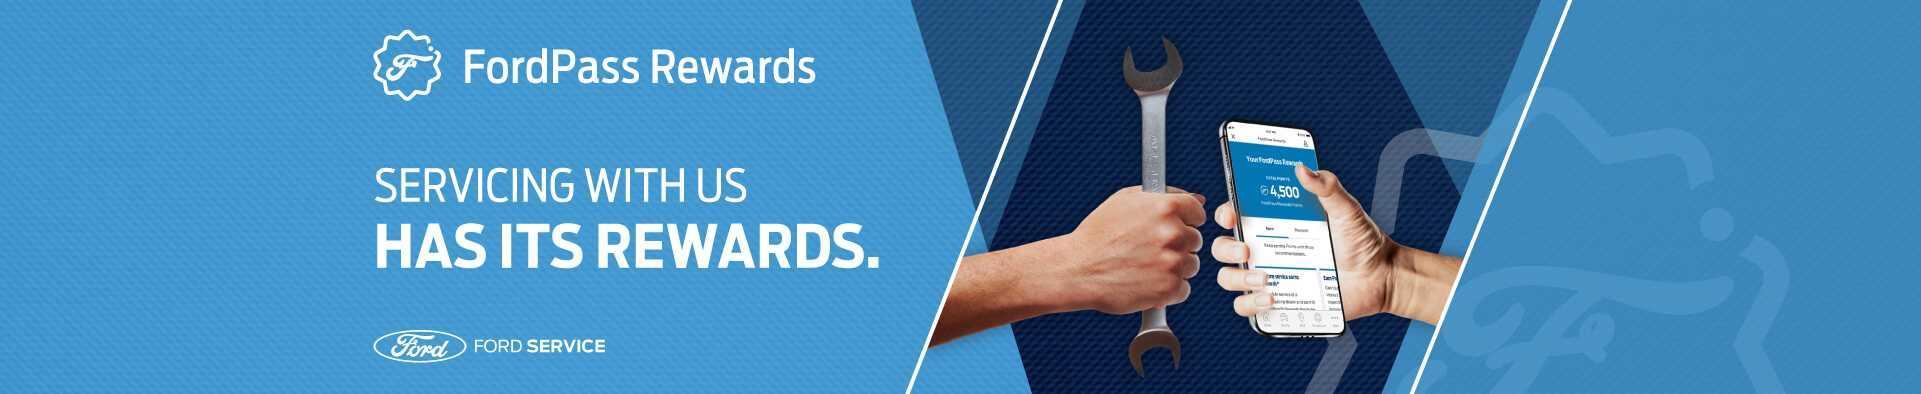 FordPass Rewards